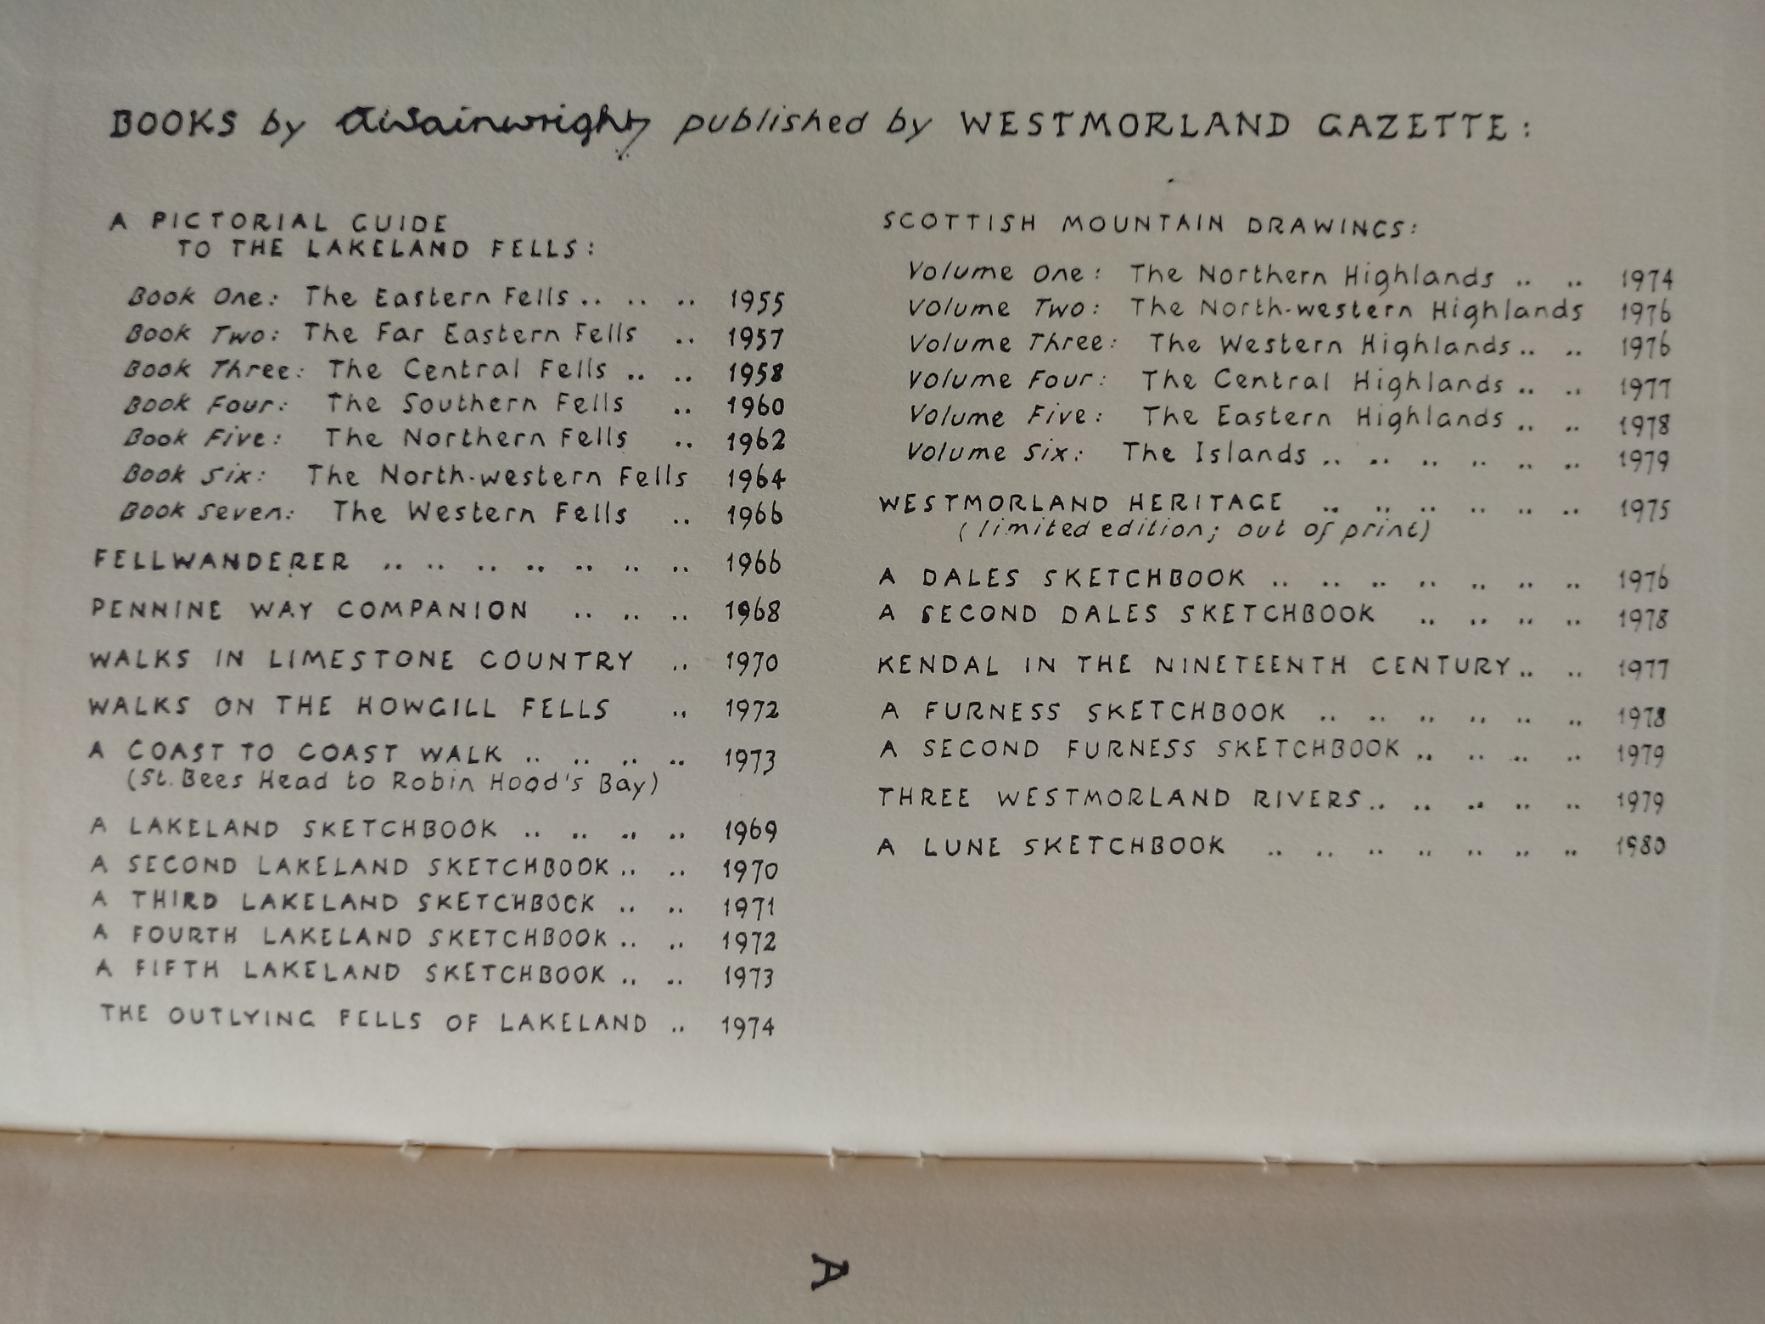 A Coast to Coast Walk by A. Wainwright hardback book 168 pages published 1973 Westmorland Gazette. - Image 2 of 2